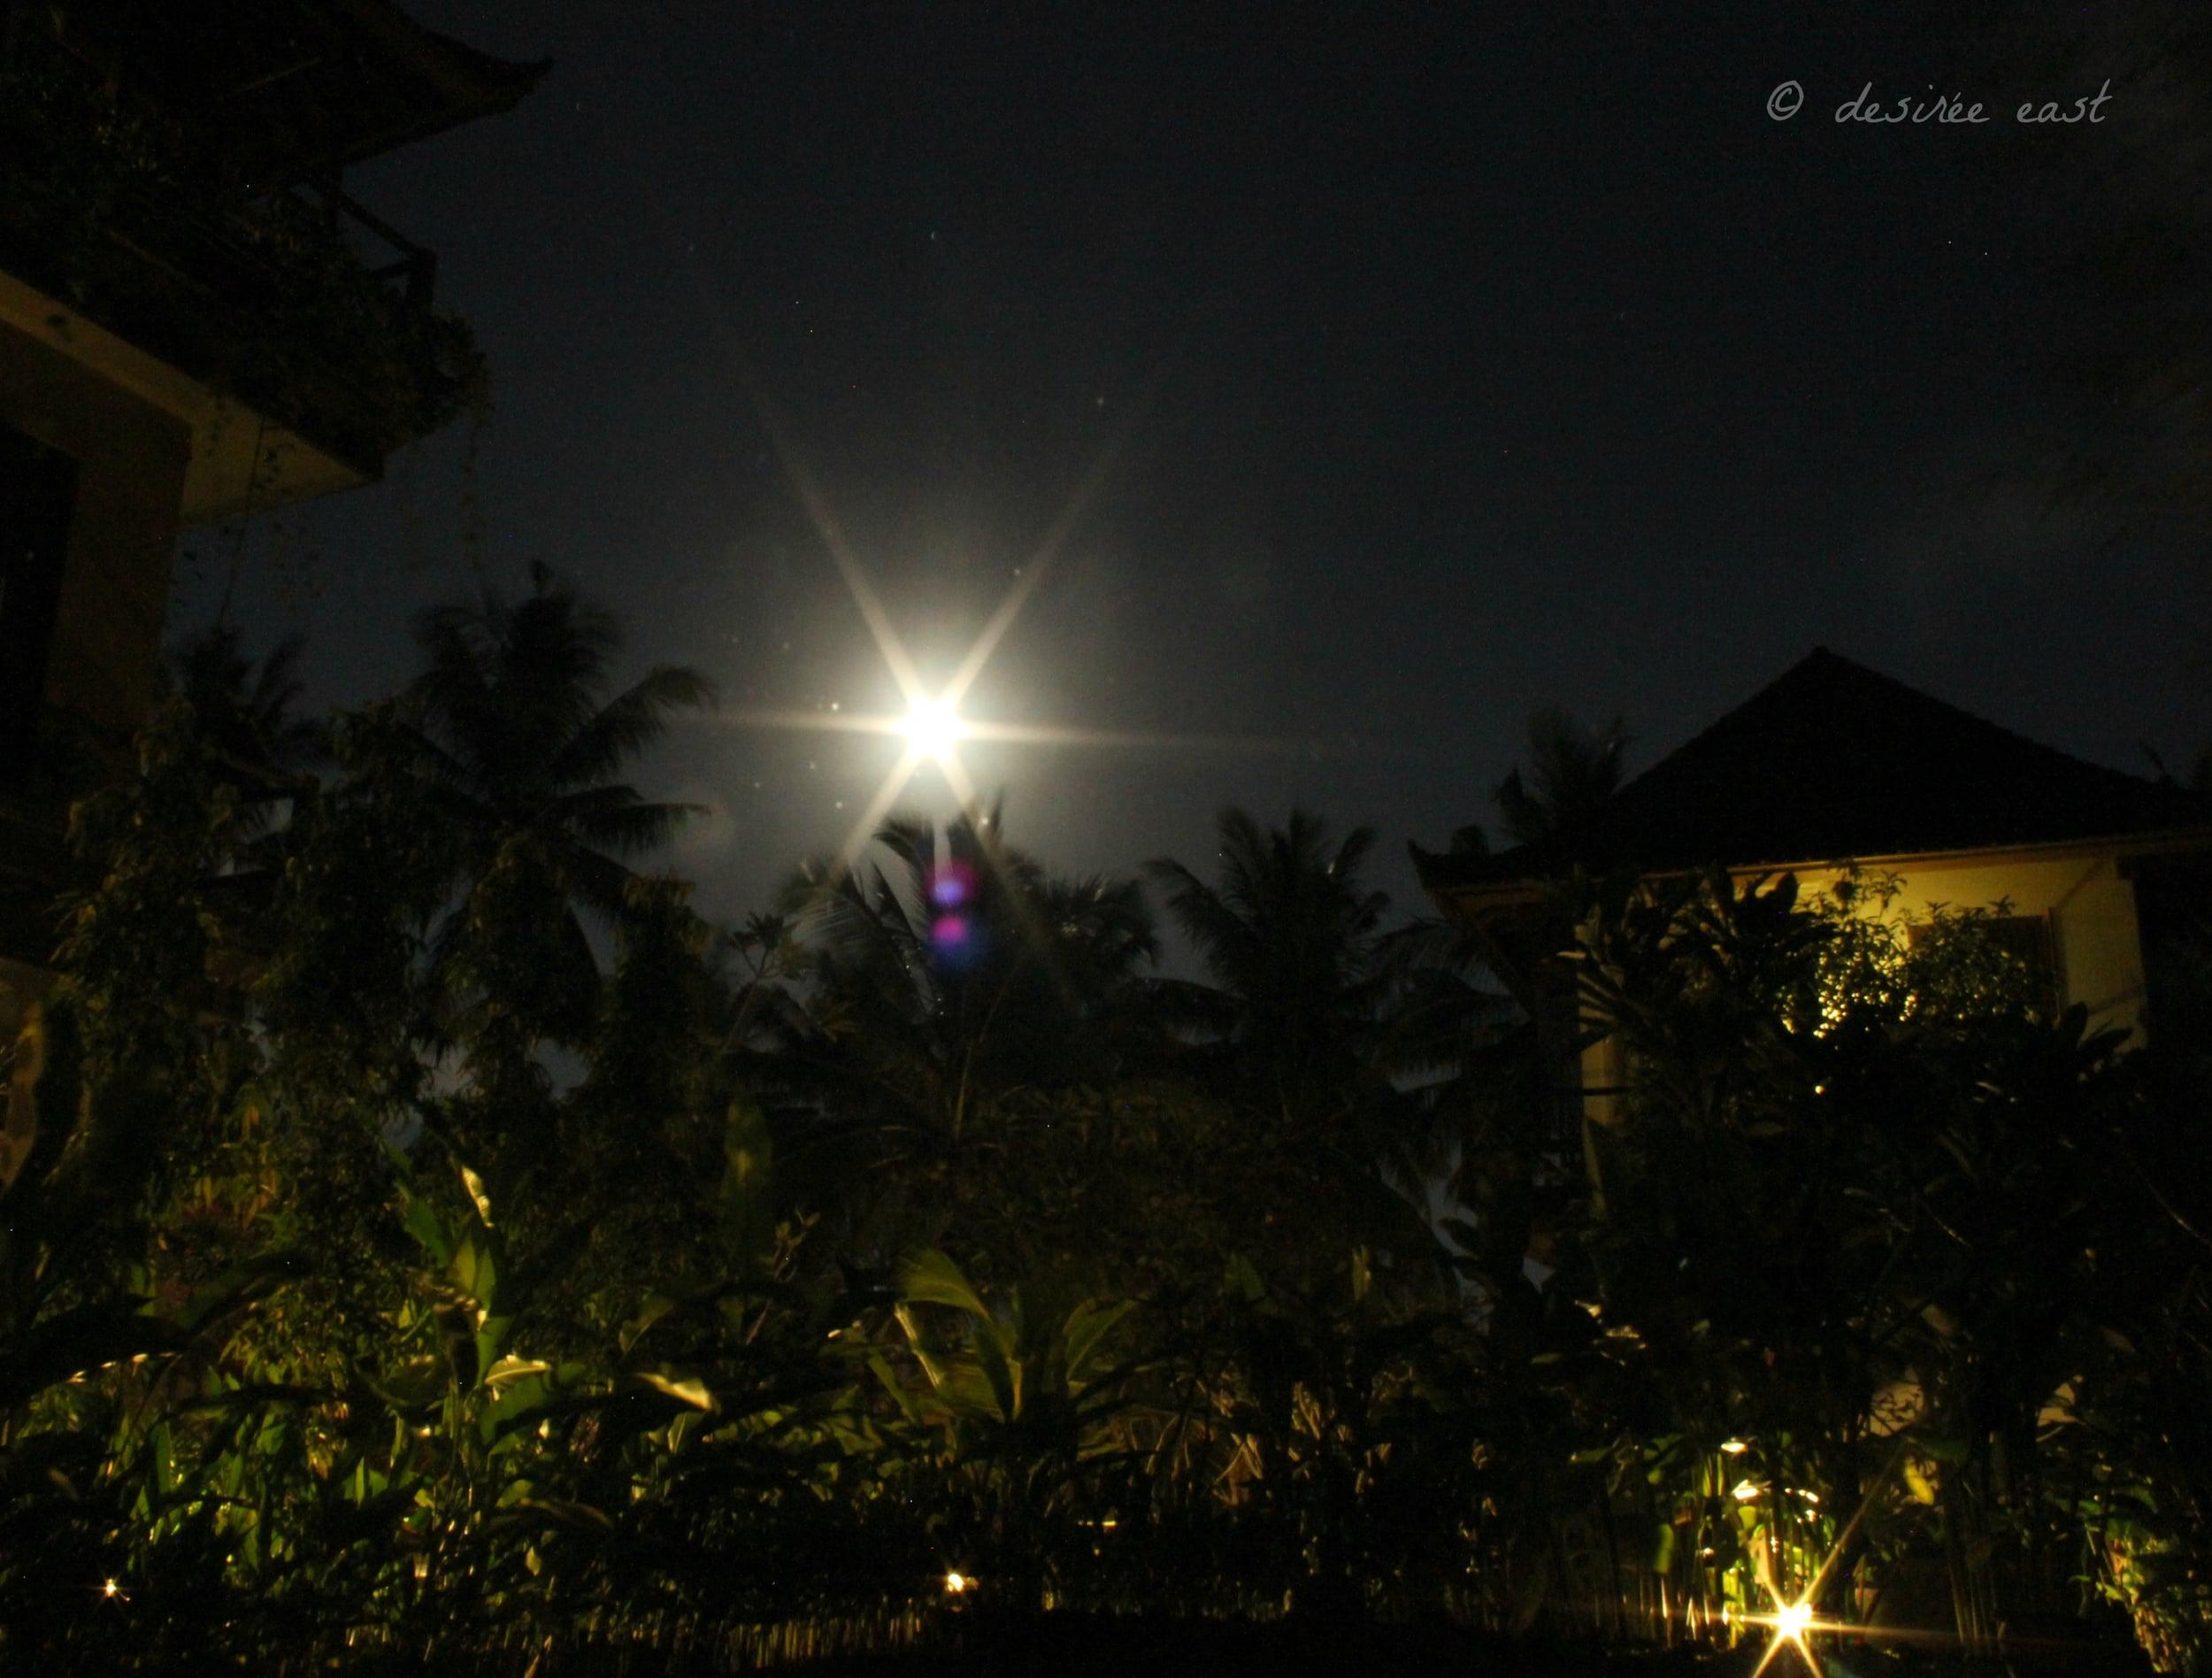 moonlit balinese night. ubud, bali, indonesia. photo by desiree east